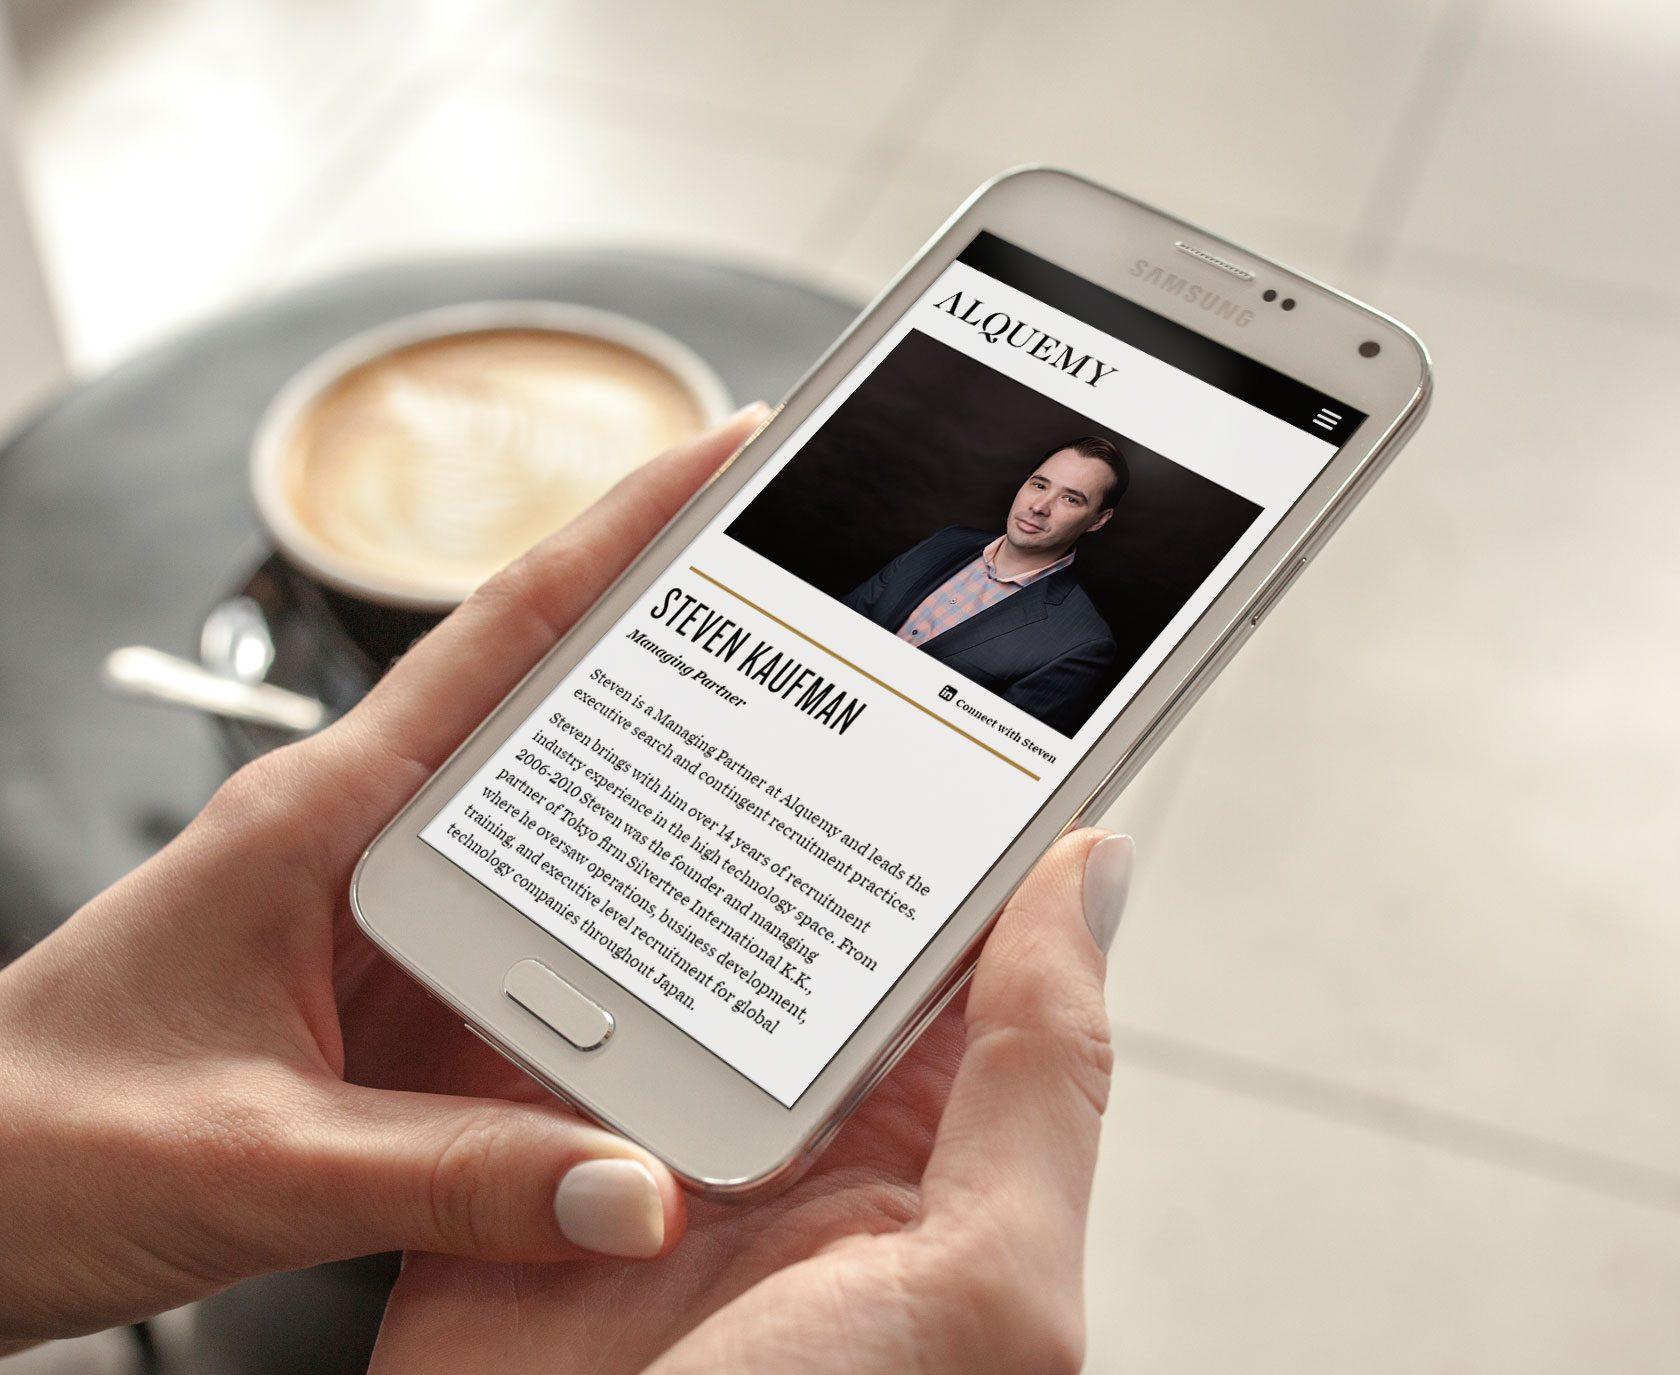 Alquemy Mobile Website Design and Development by Furia